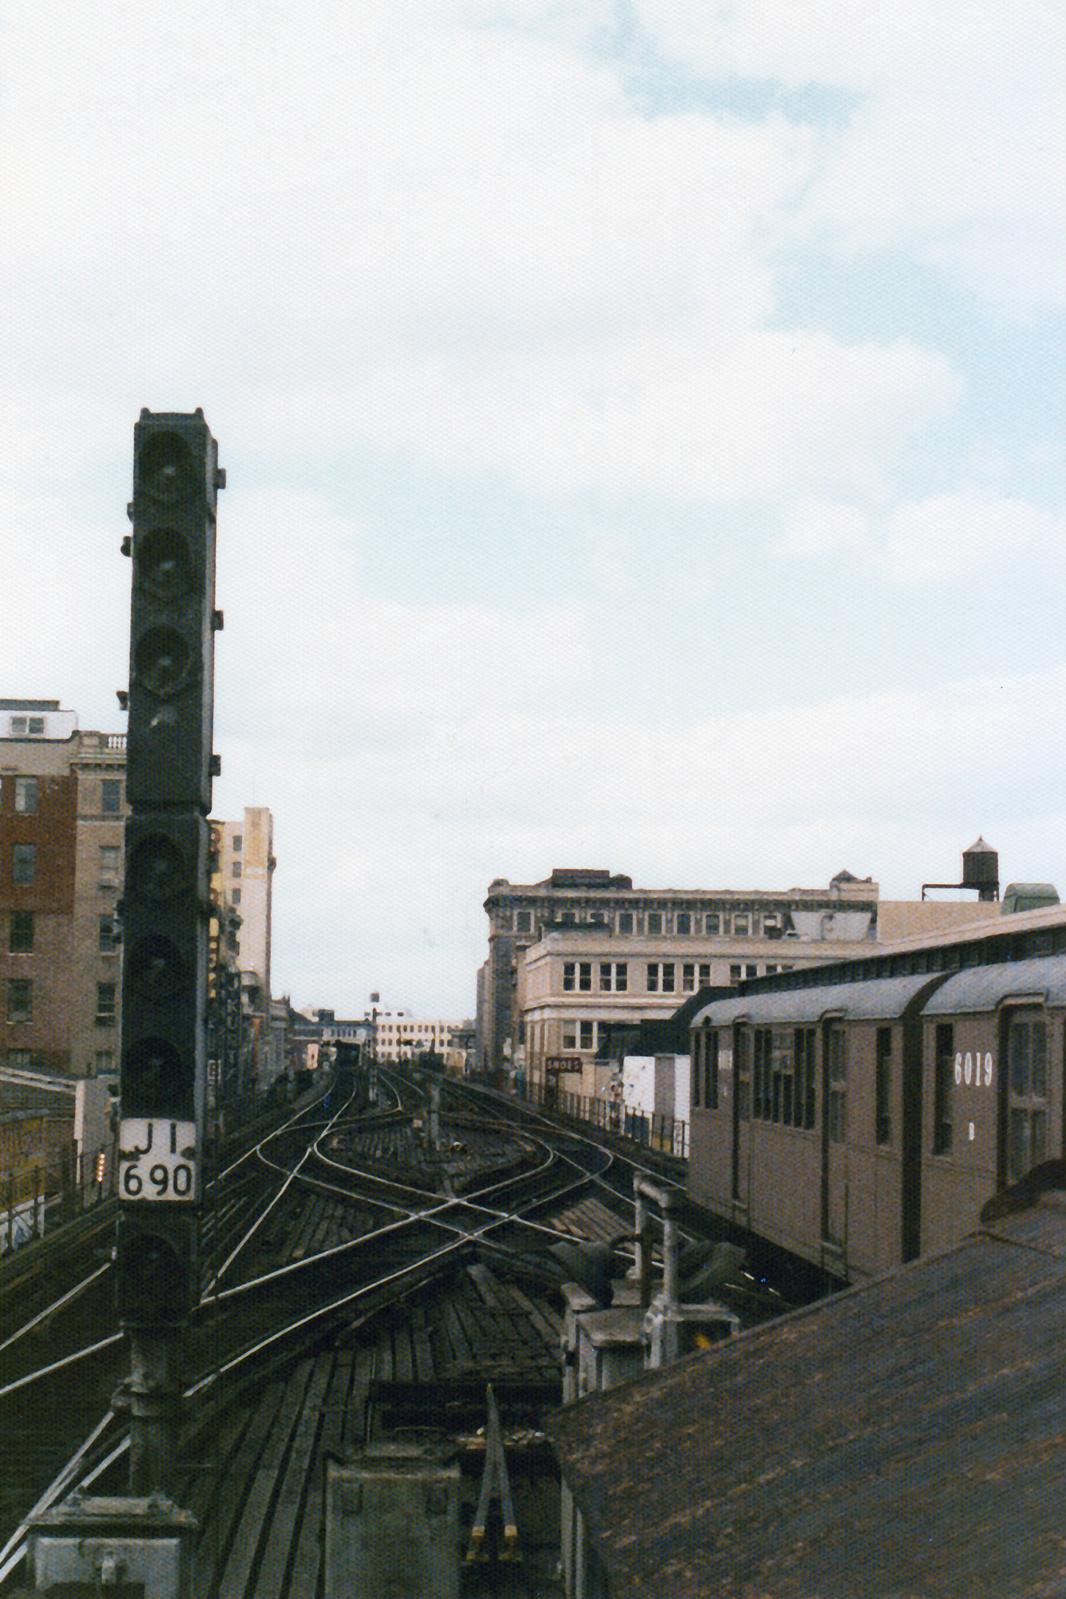 (821k, 1066x1599)<br><b>Country:</b> United States<br><b>City:</b> New York<br><b>System:</b> New York City Transit<br><b>Line:</b> BMT Nassau Street-Jamaica Line<br><b>Location:</b> 168th Street (Demolished)<br><b>Route:</b> Fan Trip<br><b>Car:</b> BMT D-Type Triplex 6019 <br><b>Collection of:</b> Nicholas Fabrizio<br><b>Date:</b> 9/1/1977<br><b>Viewed (this week/total):</b> 1 / 604